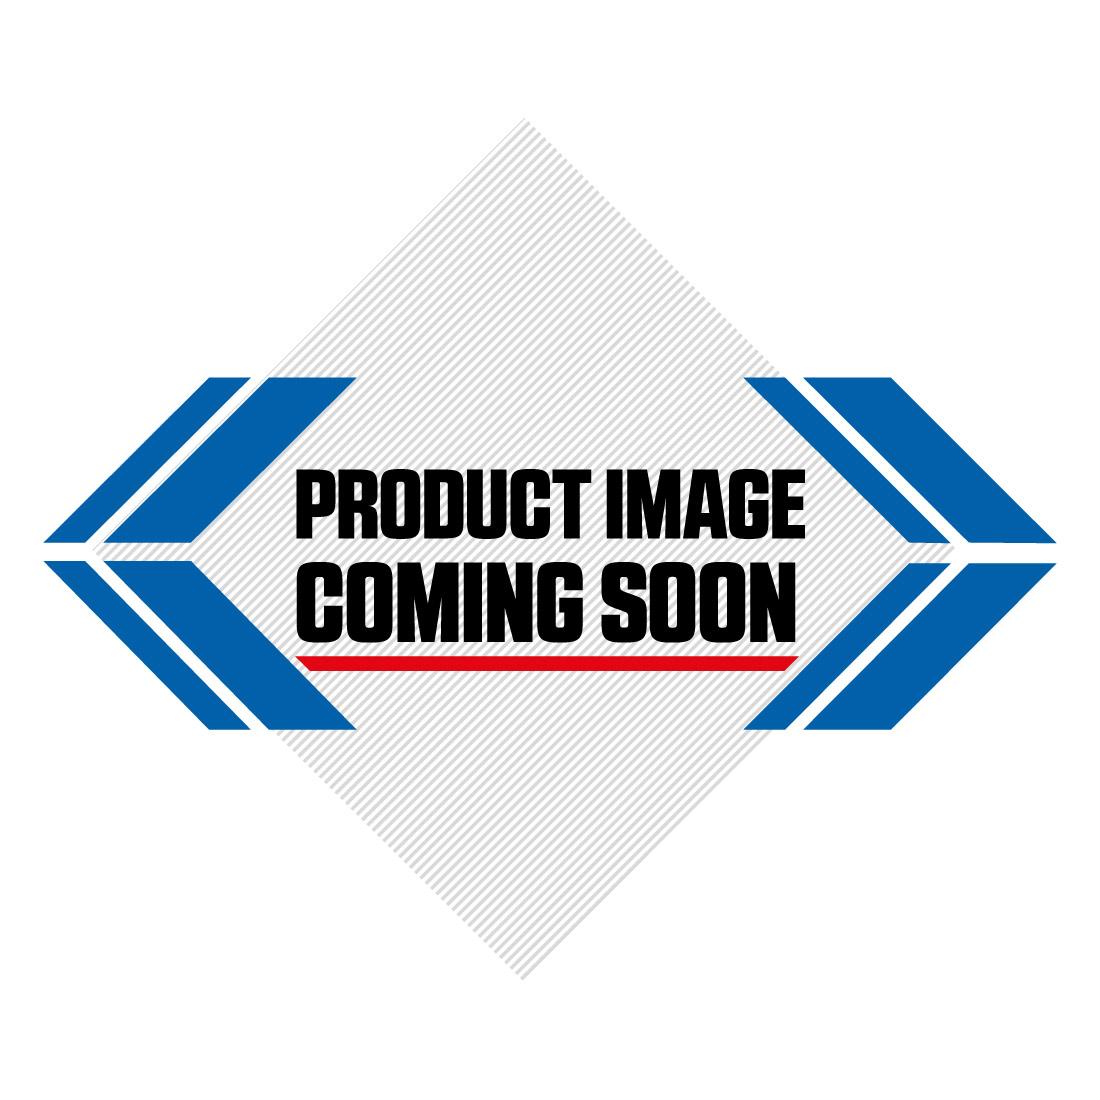 DJI Mavic 2 Pro Drone Image-2>